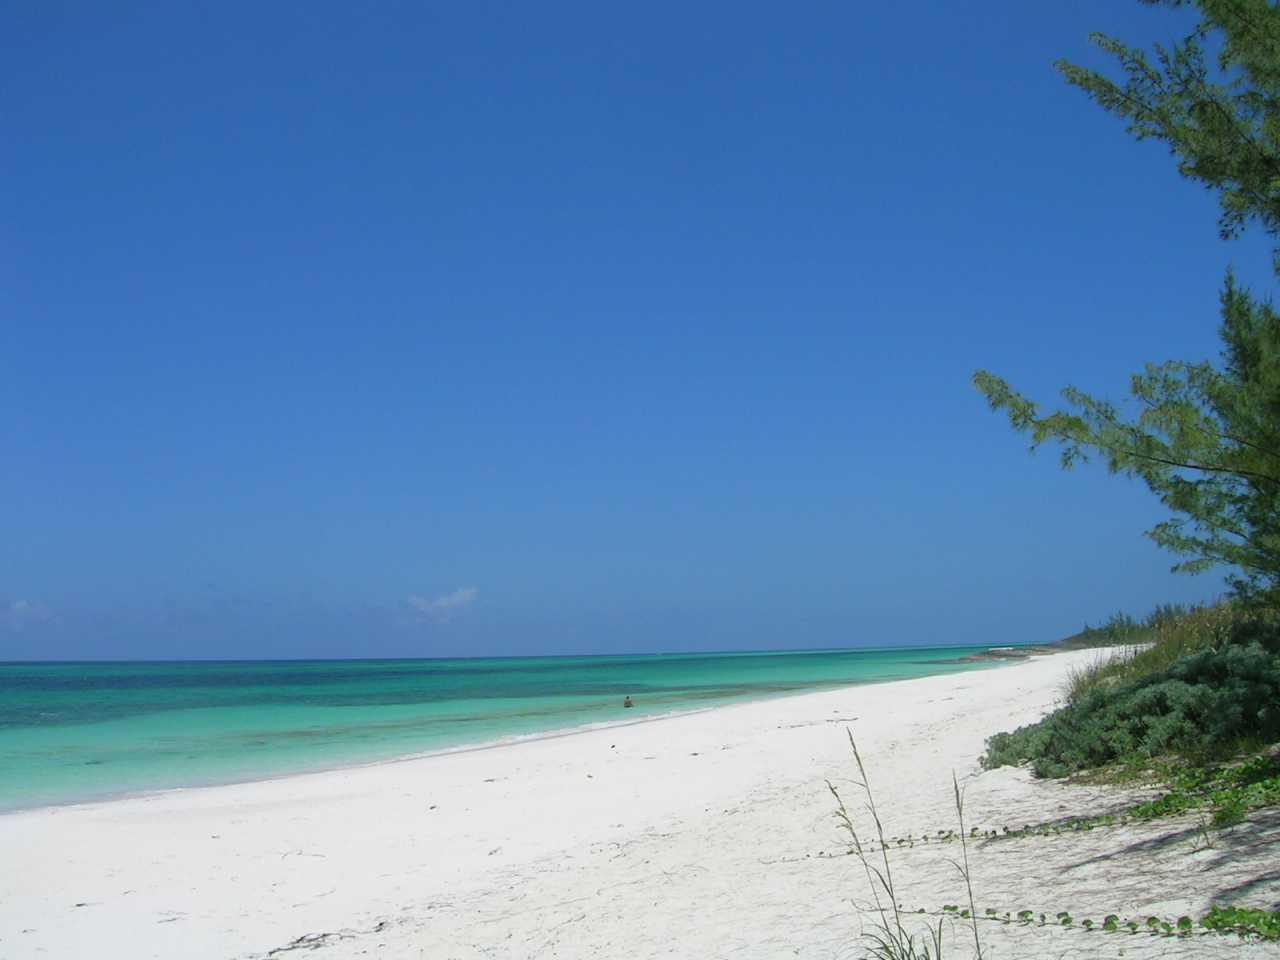 Tay bay beach in Eleuthera